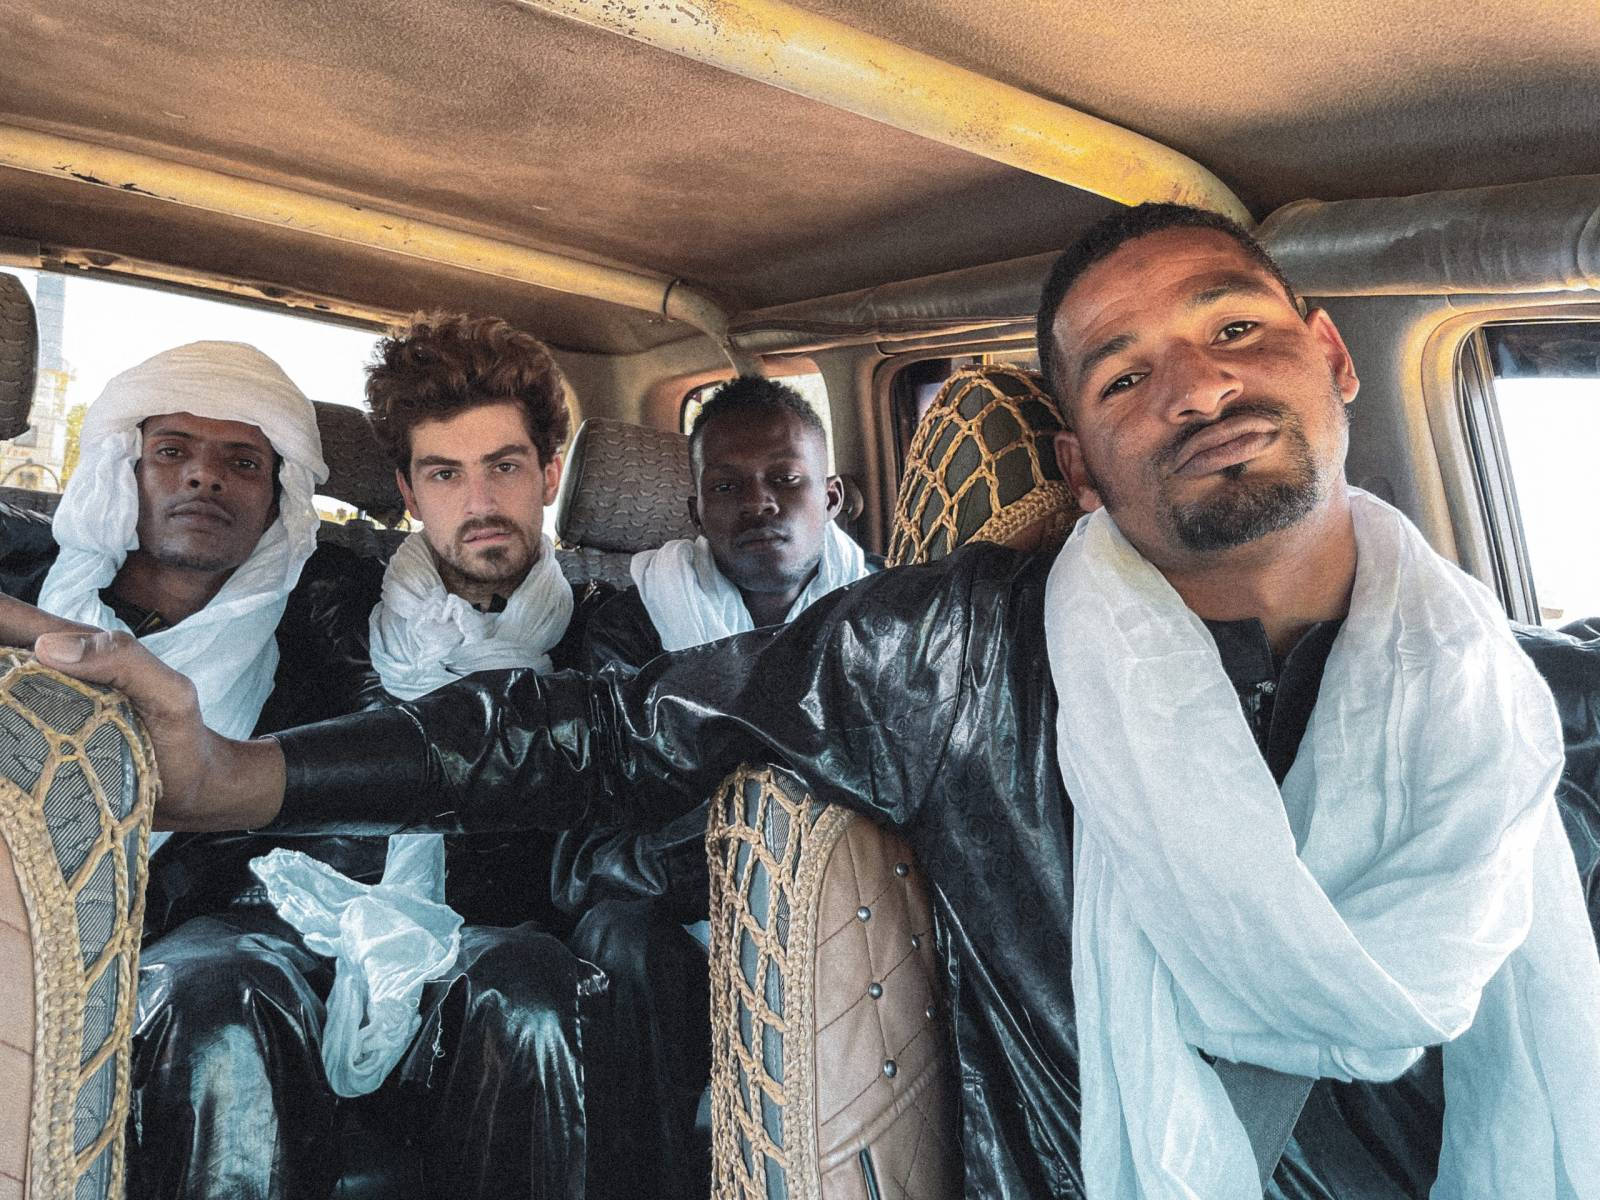 Mdou Moctar – Πια, η Αφρική βγάζει τους καλύτερους ροκ κιθαρίστες;